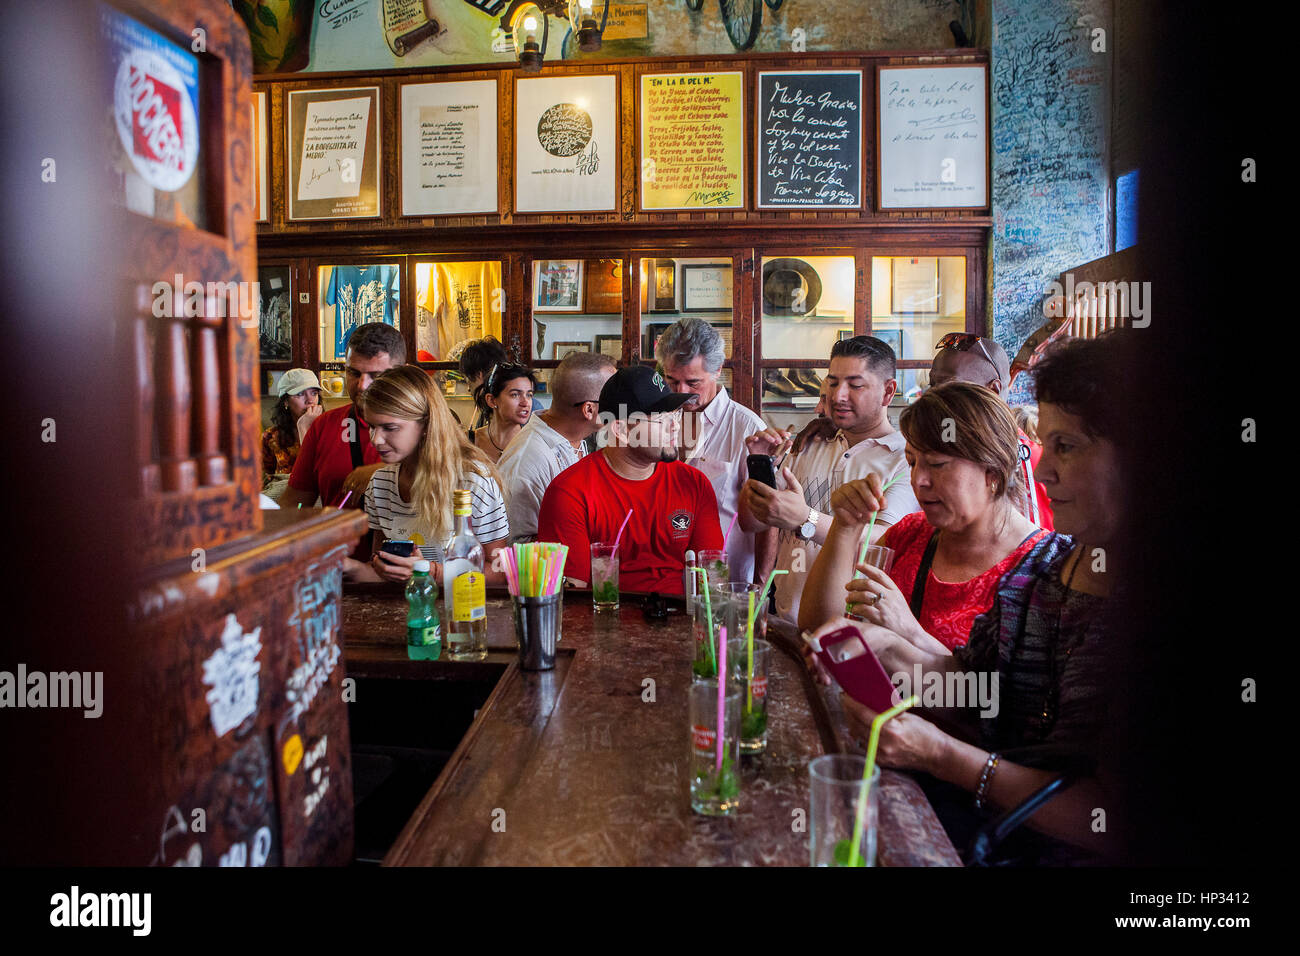 La Bodeguita del Medio, Habana Vieja, La Habana, Kuba Stockbild